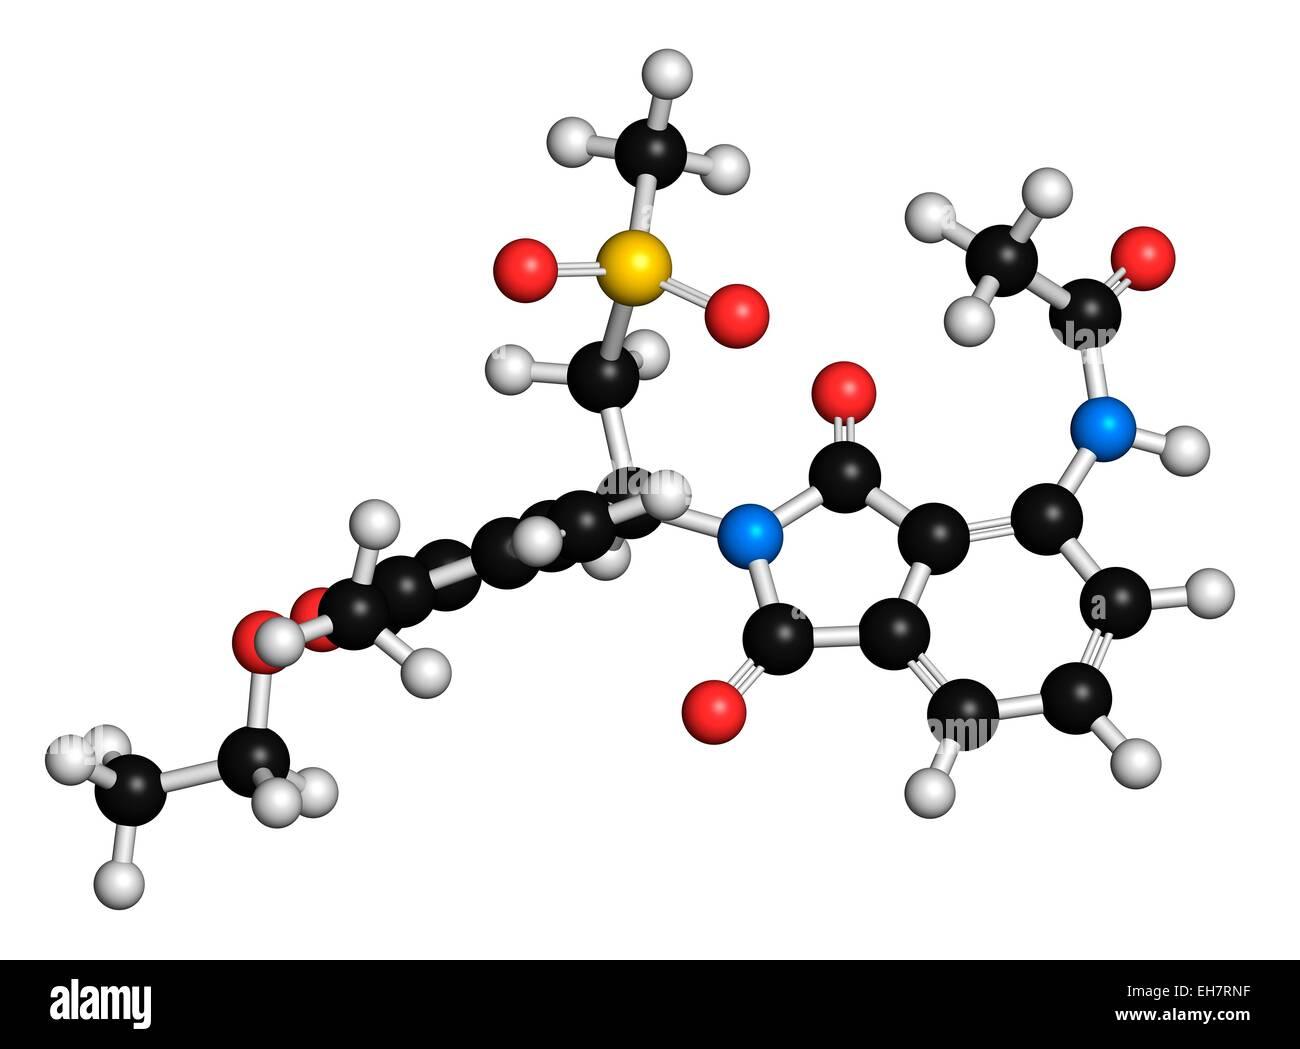 Apremilast psoriasis drug molecule - Stock Image